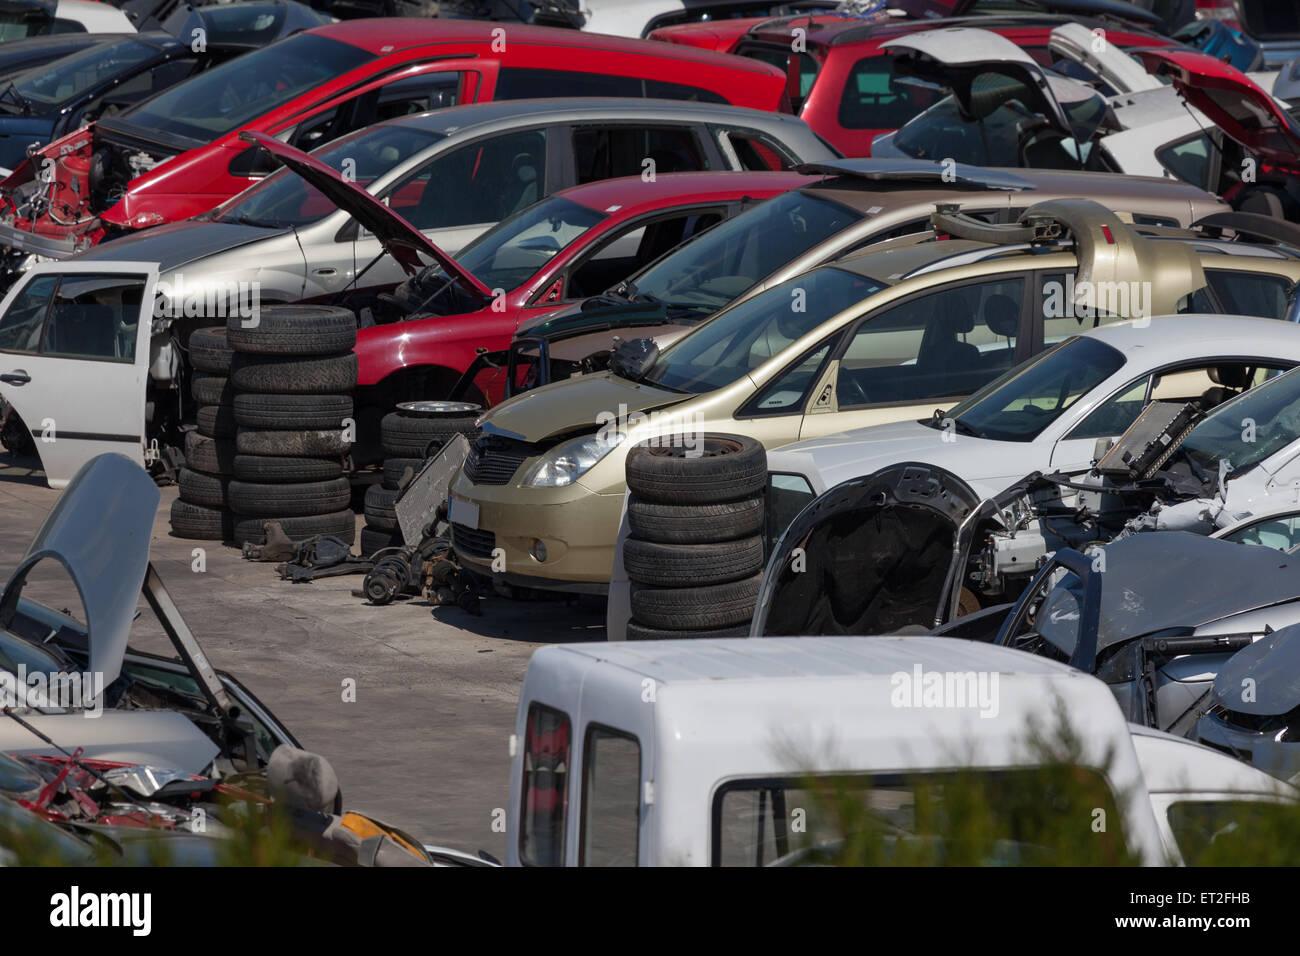 Old cars at the scrap yard - Stock Image